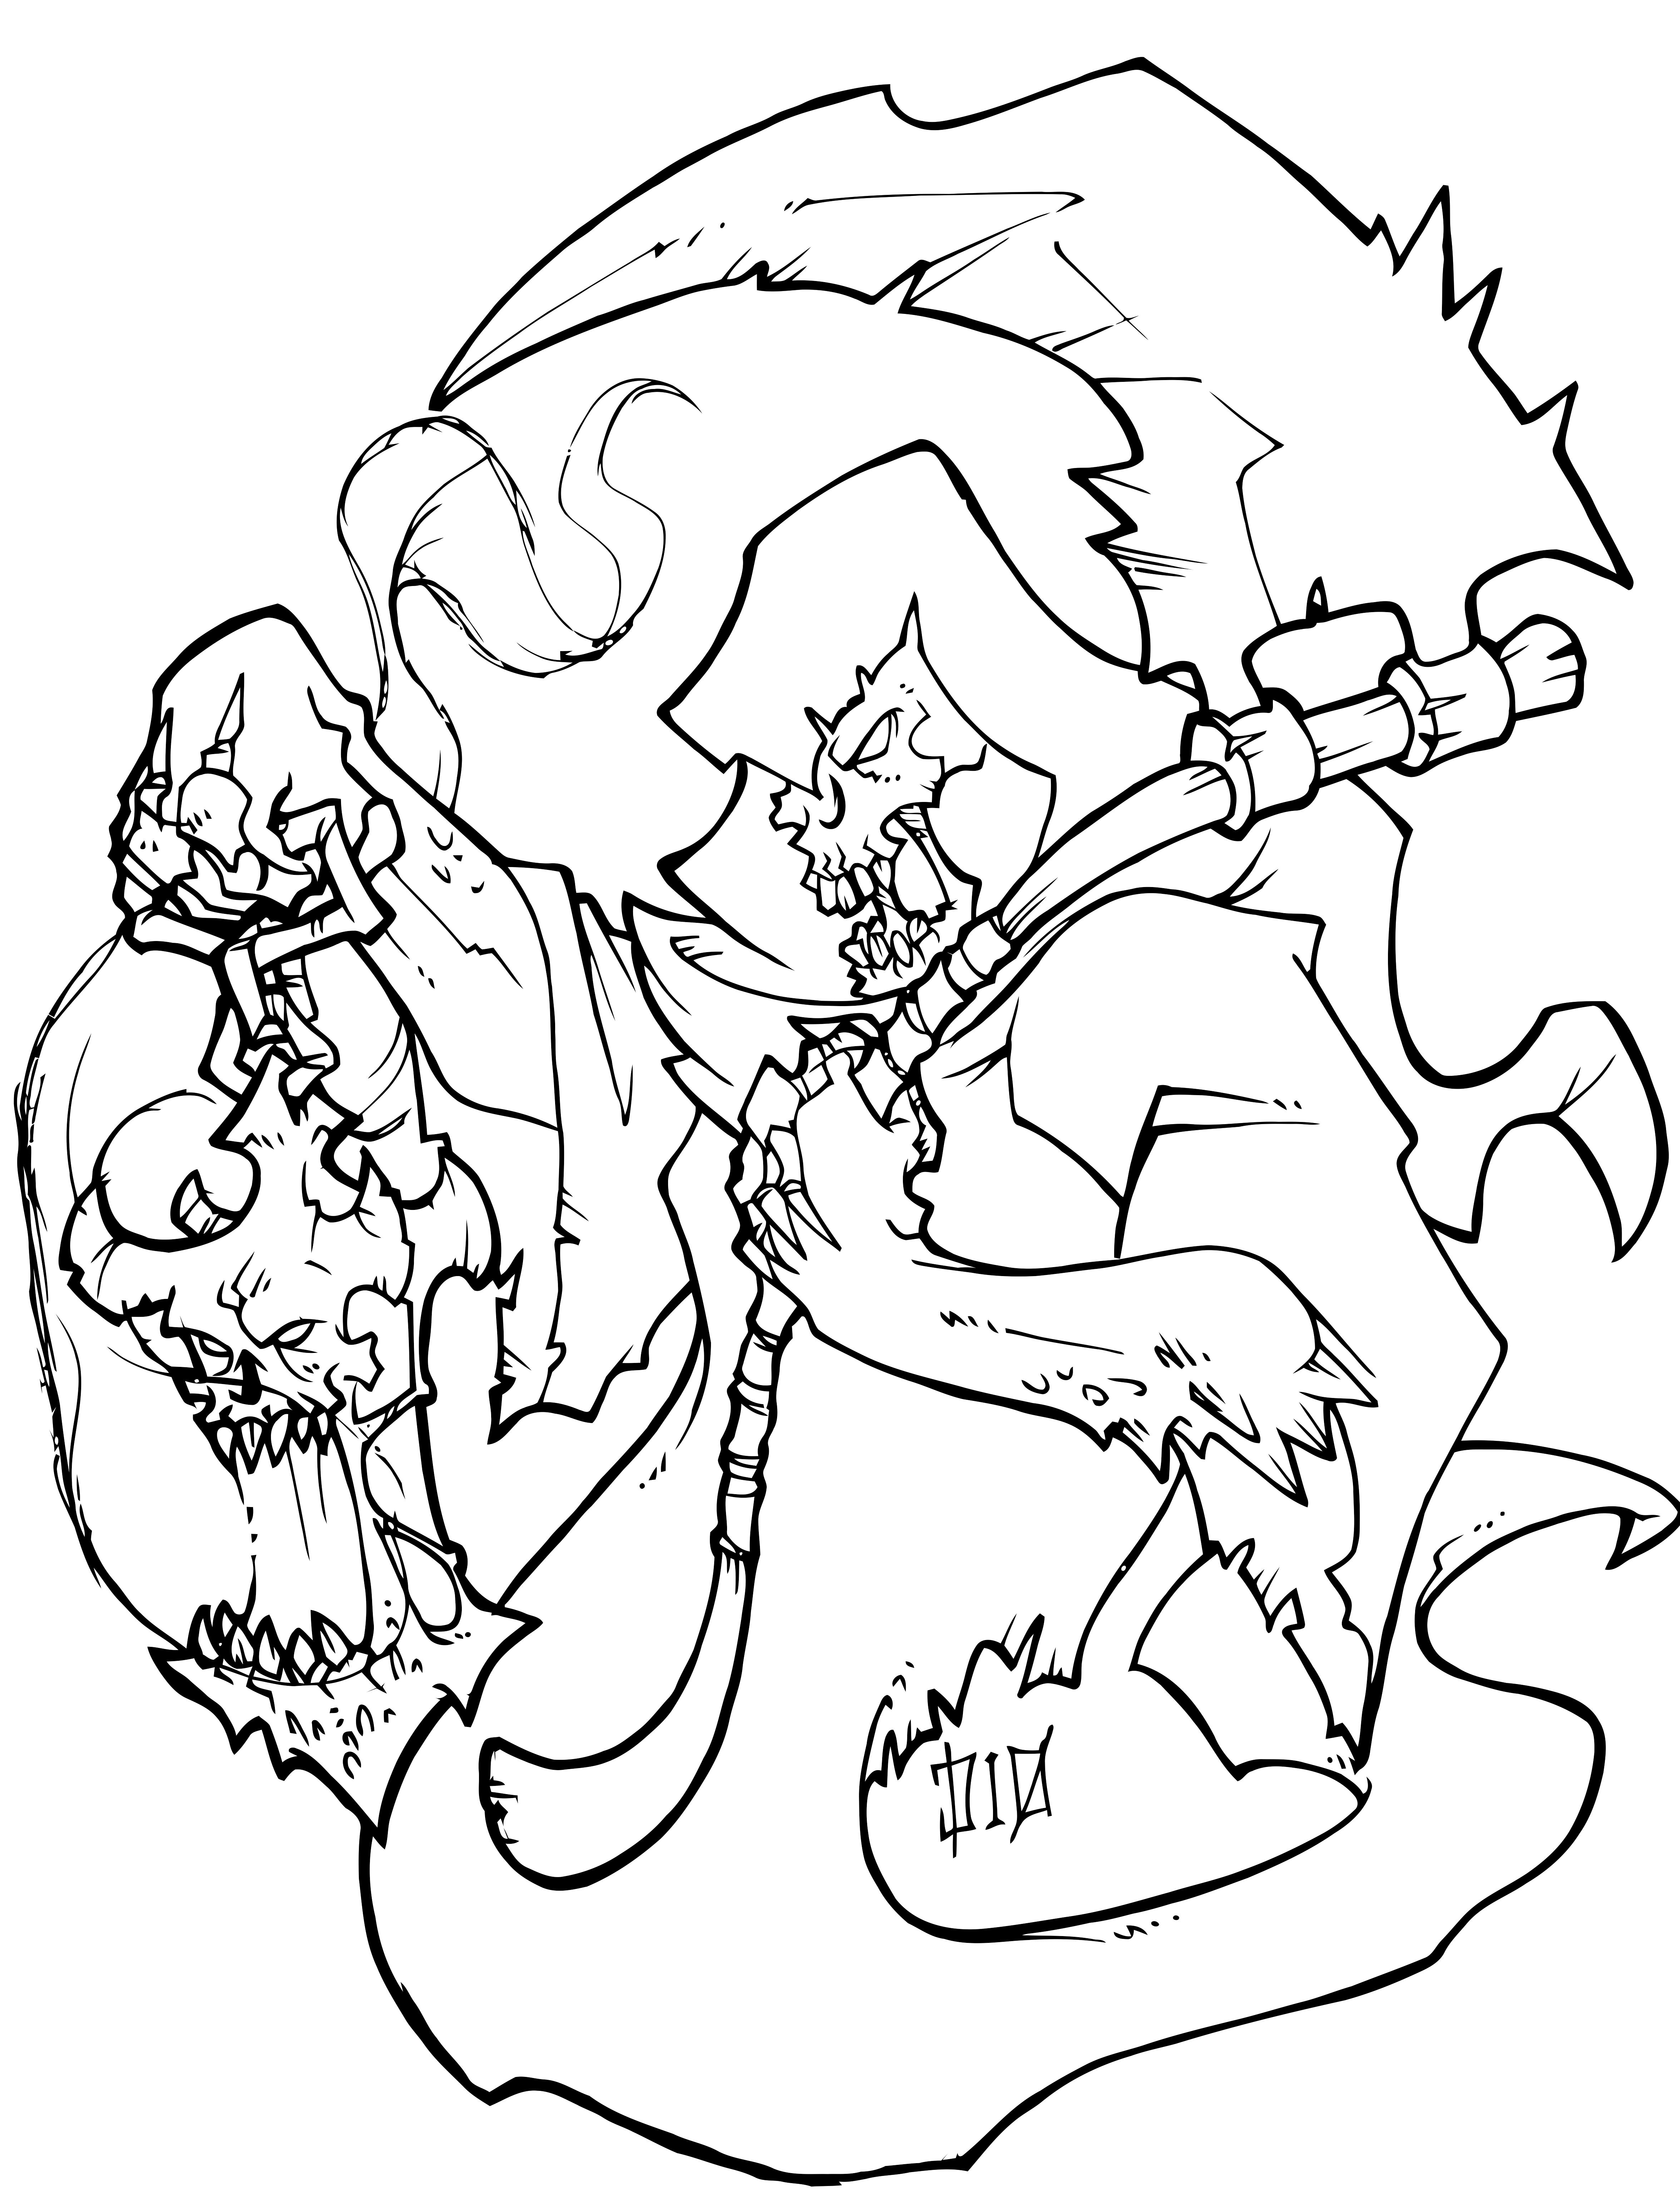 grim reaper_vectorized